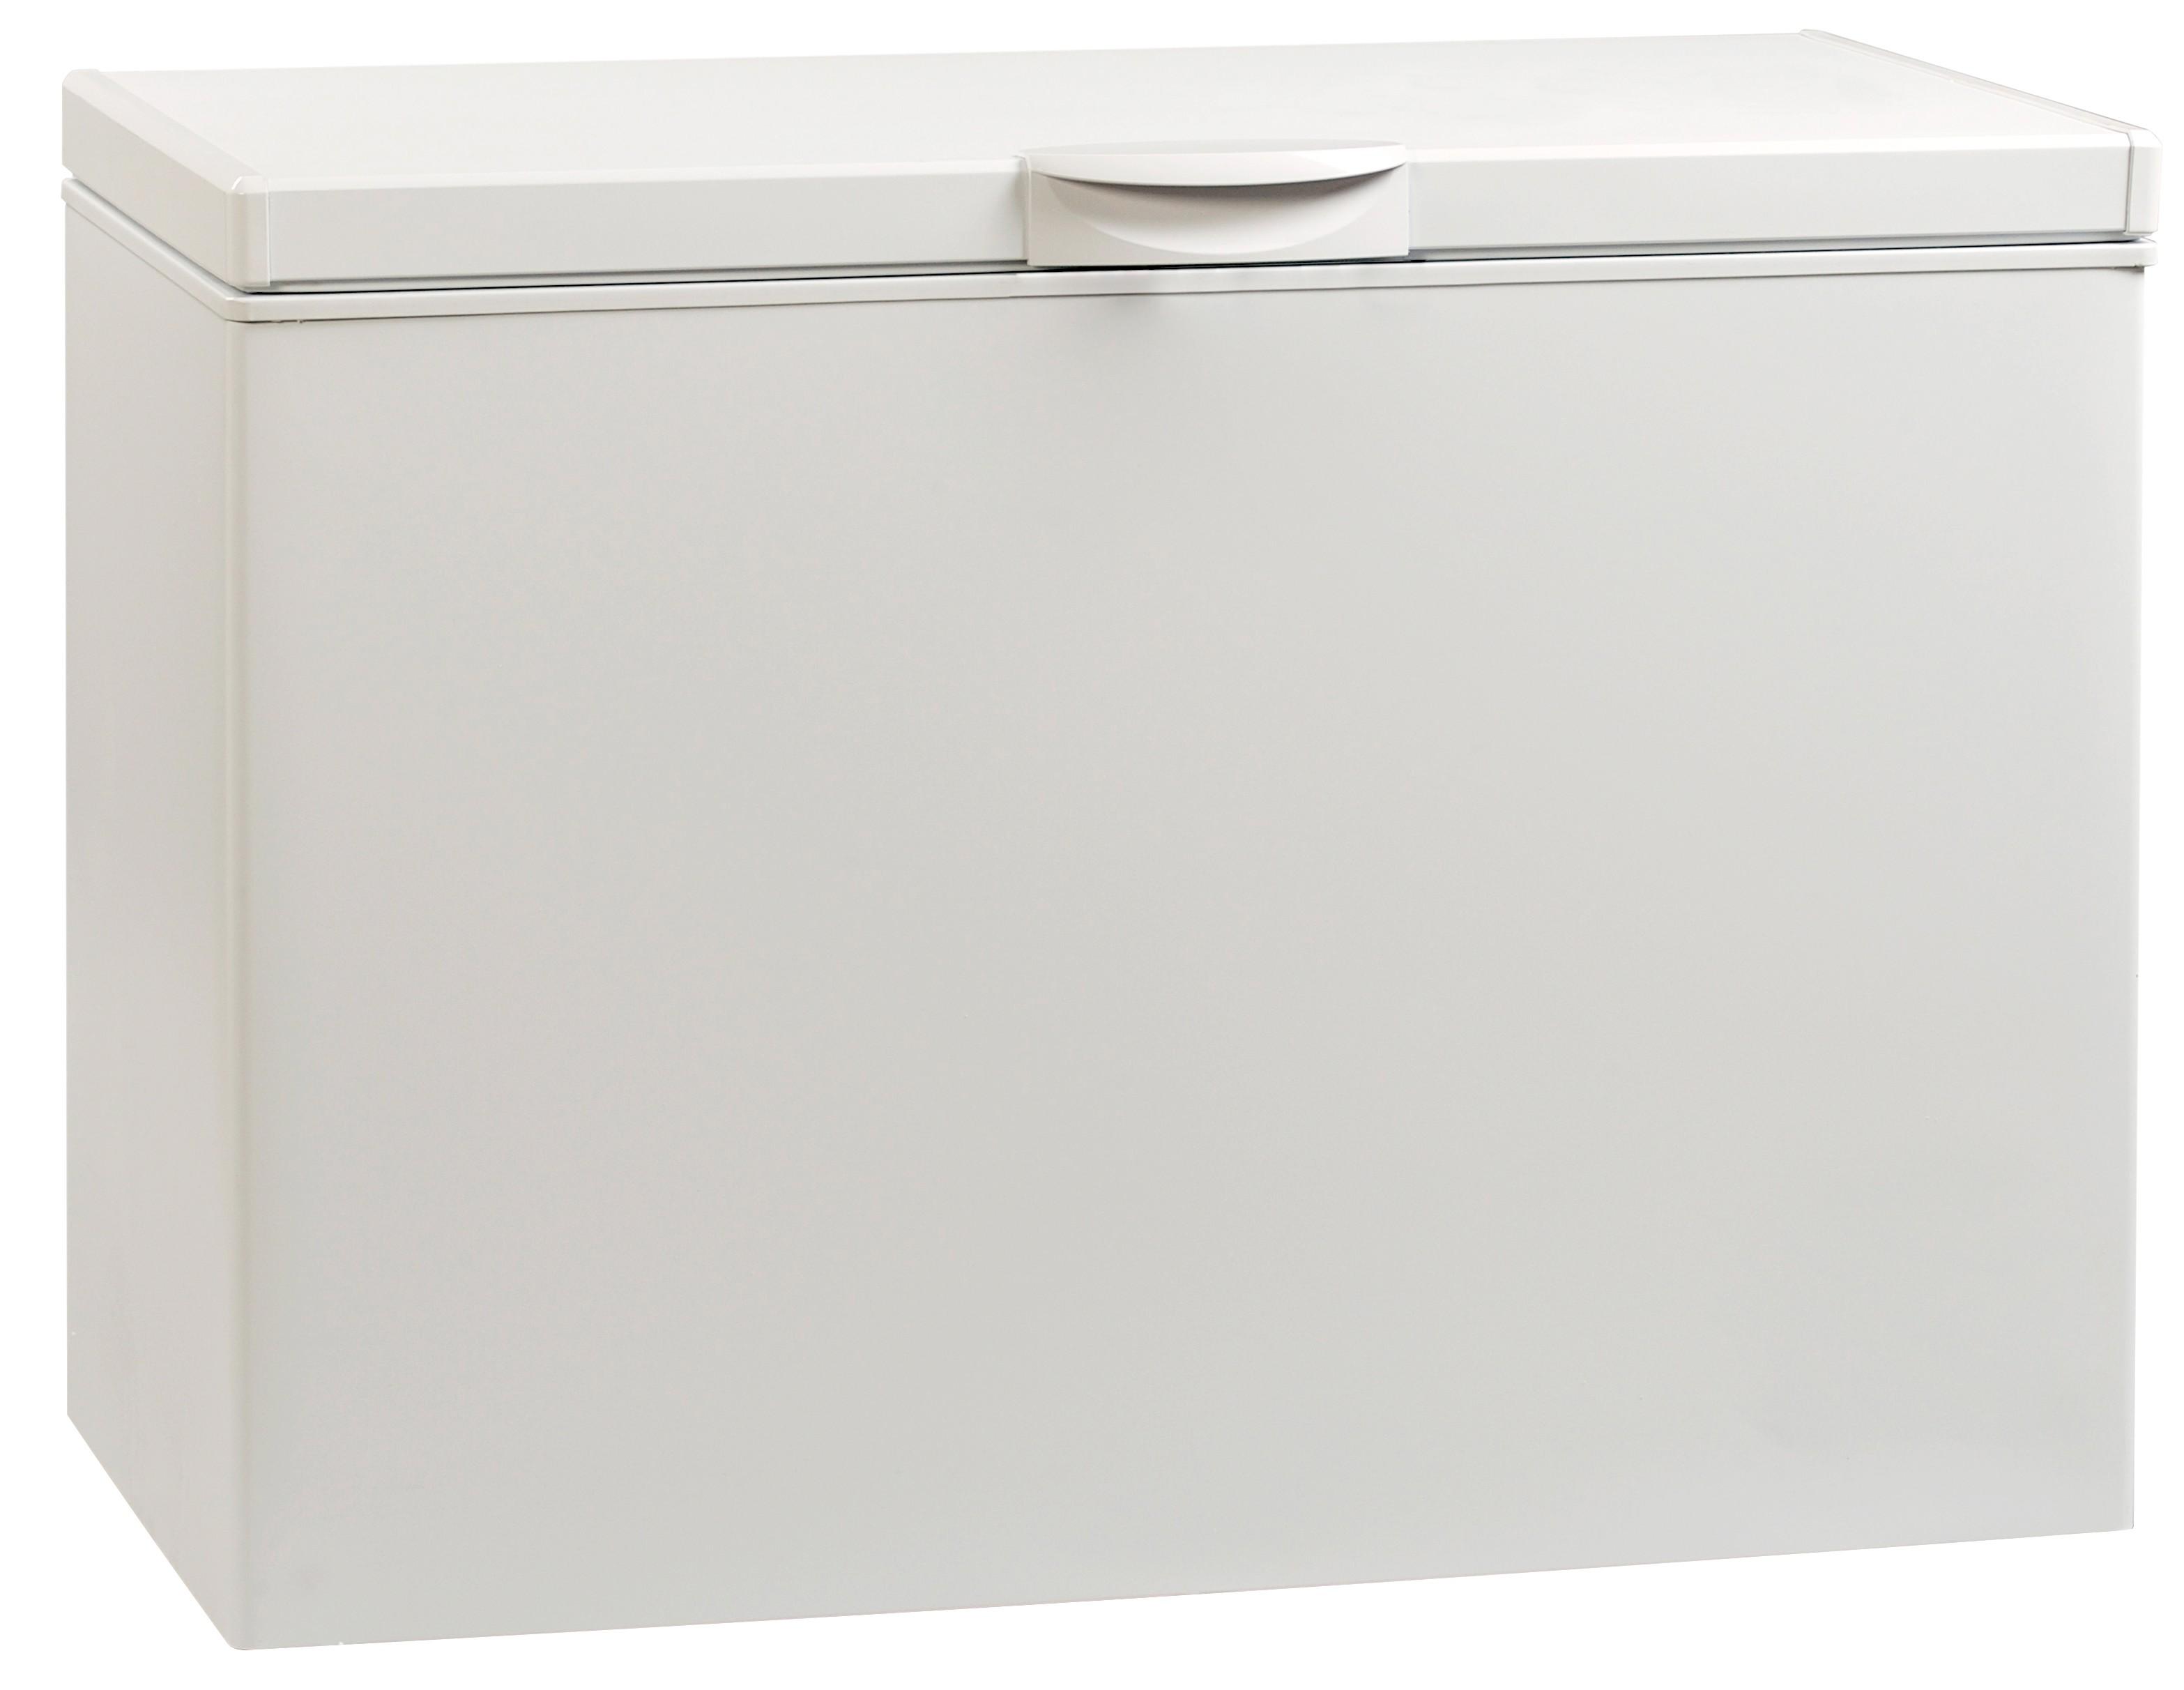 Lada frigorifica Arctic OM205+, Alb, A